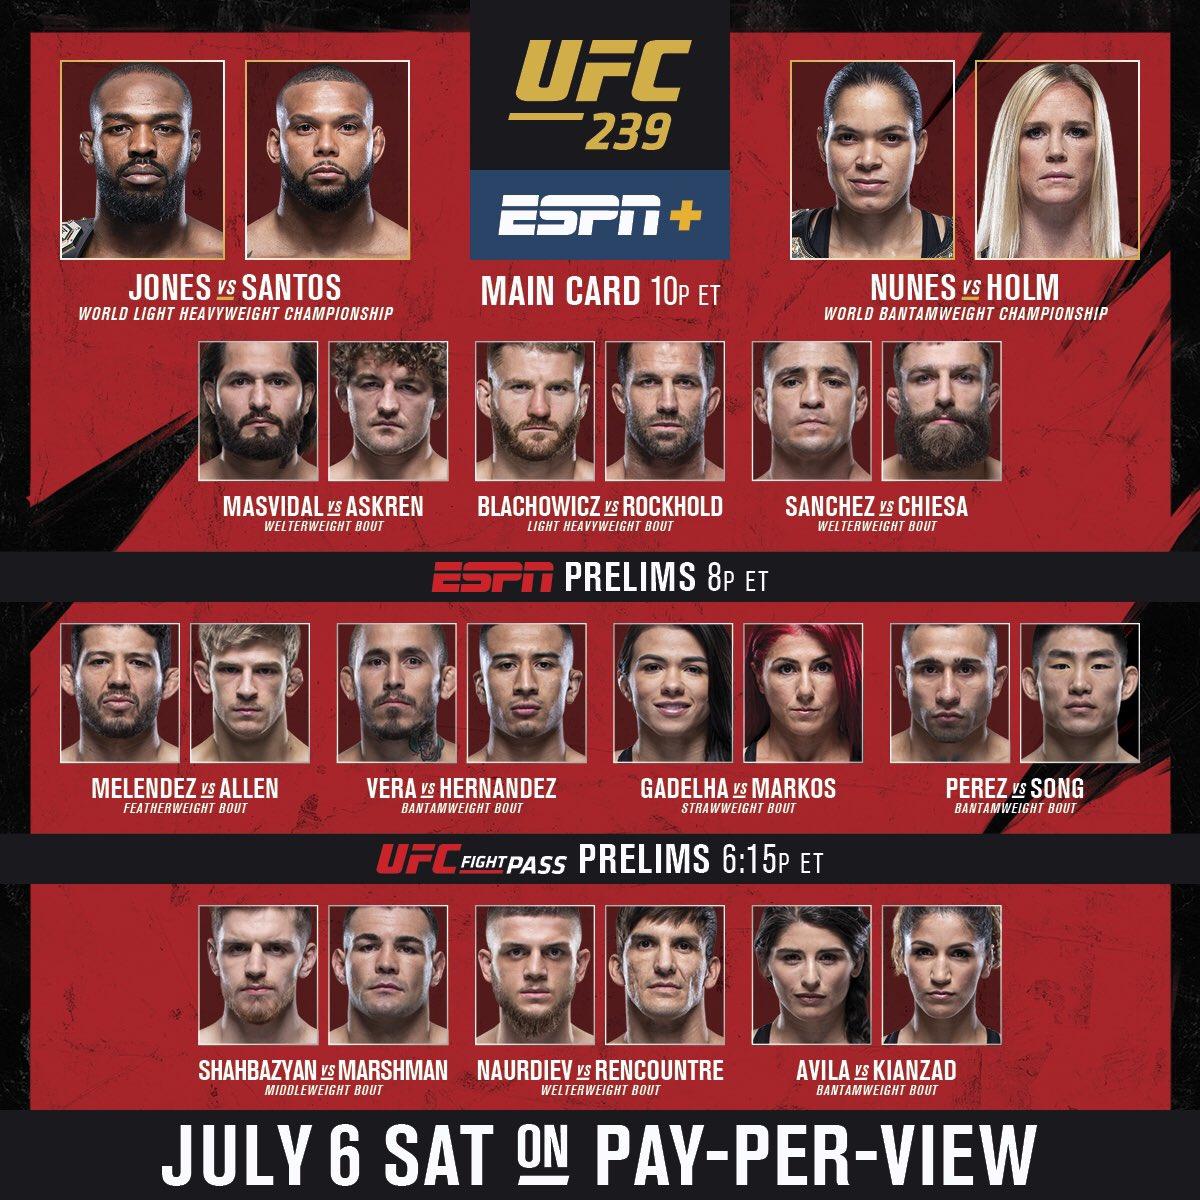 Джонс – Сантос, Нуньес вынесла Холм, Масвидаль уничтожил Аскрена за 5 секунд. Онлайн UFC 239